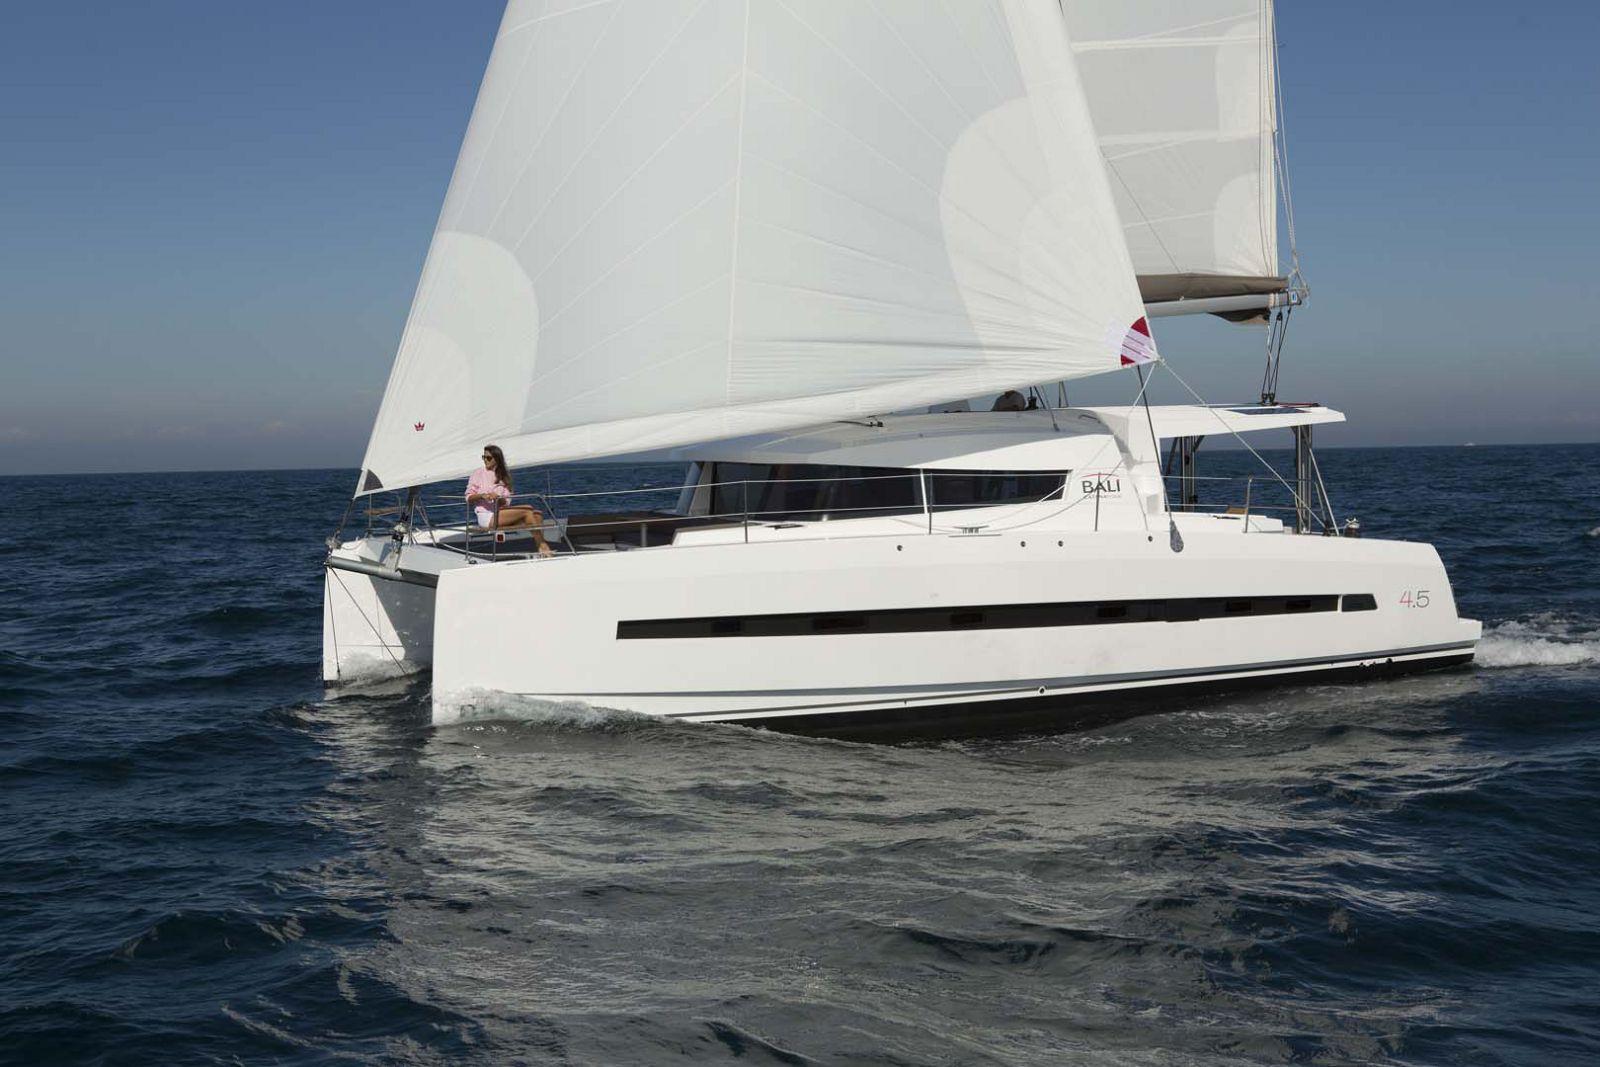 Bali 4.5 Sailing Catamaran For Sale